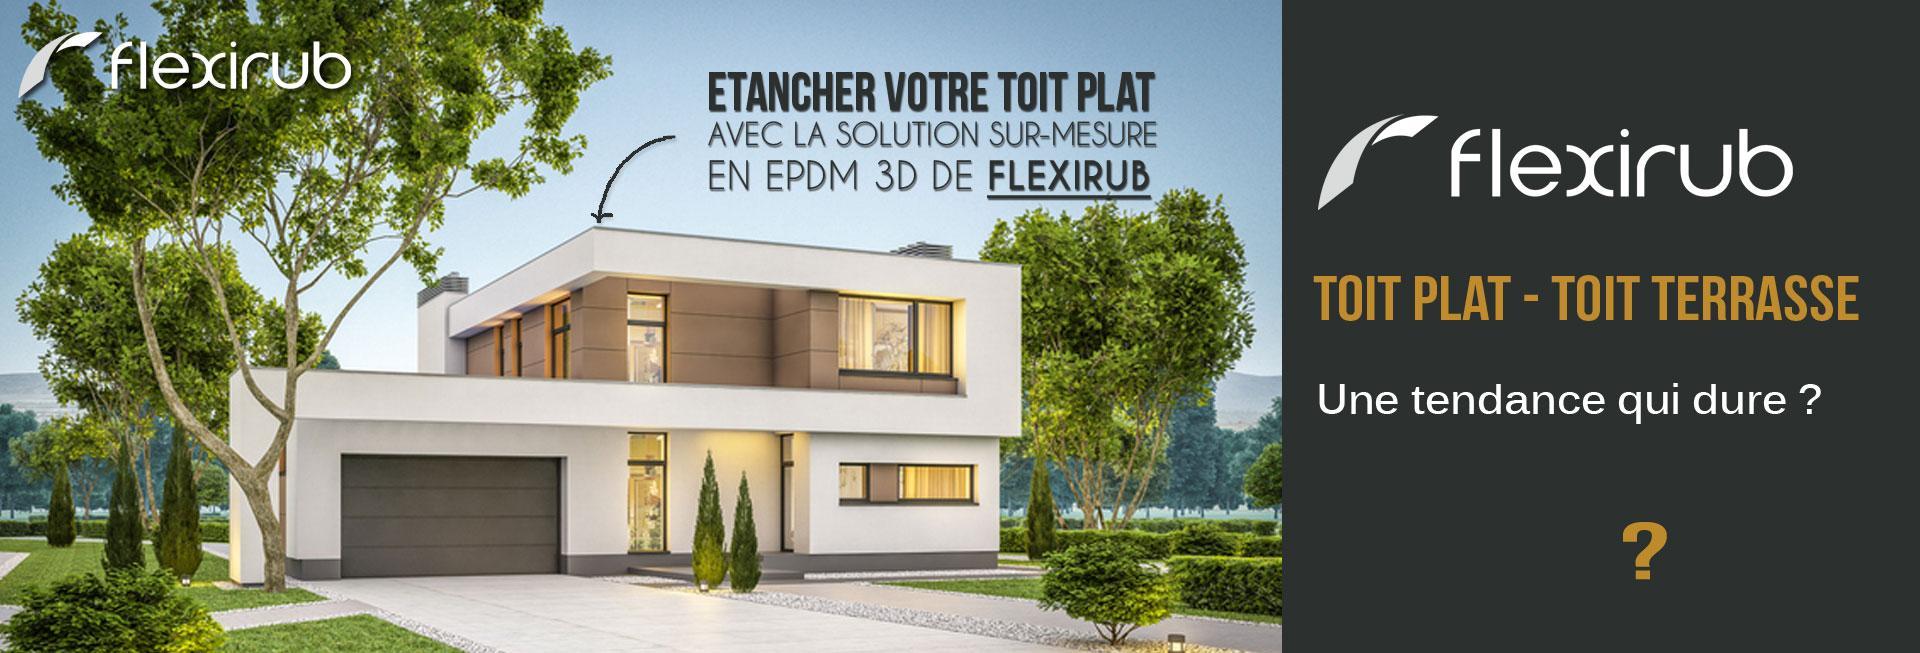 tanch it des toitures en membrane epdm sur mesure. Black Bedroom Furniture Sets. Home Design Ideas